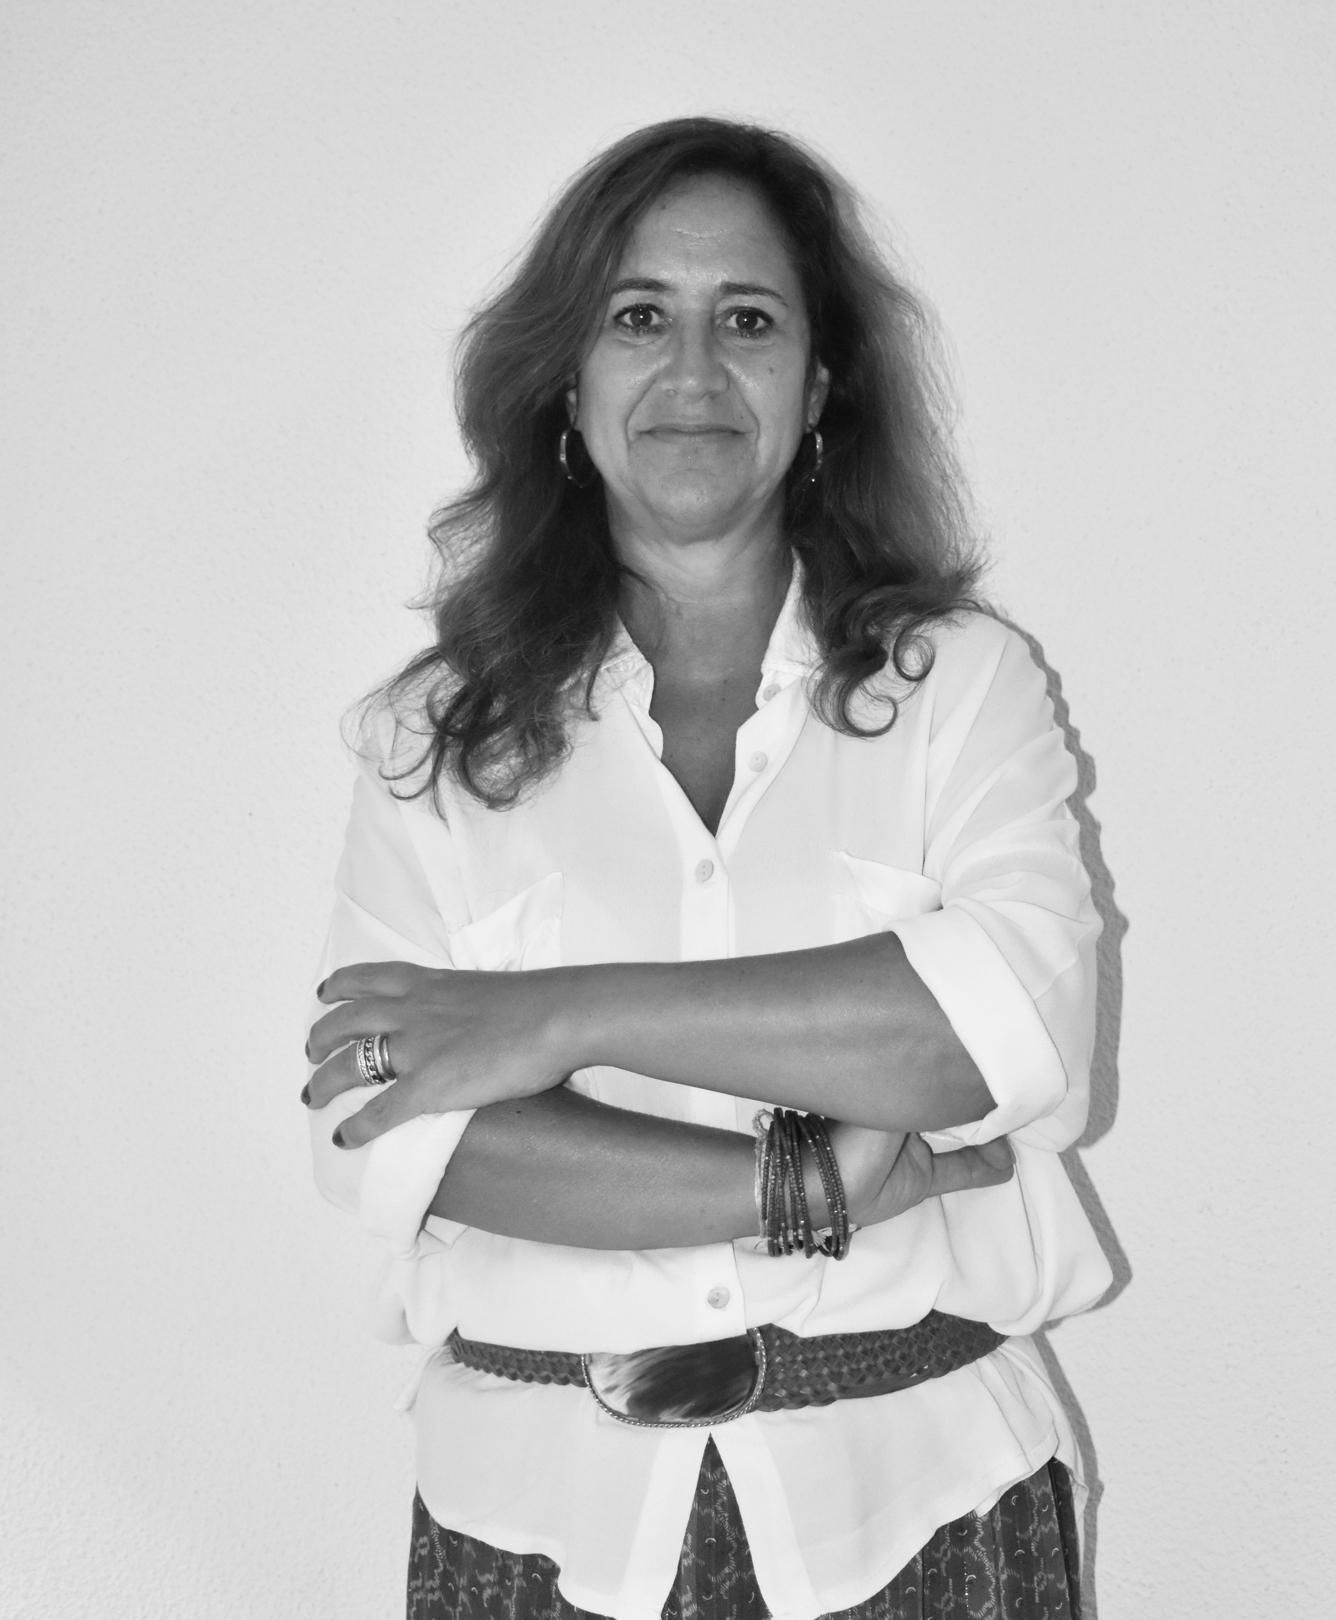 Cristina Cunha da Mota foto.